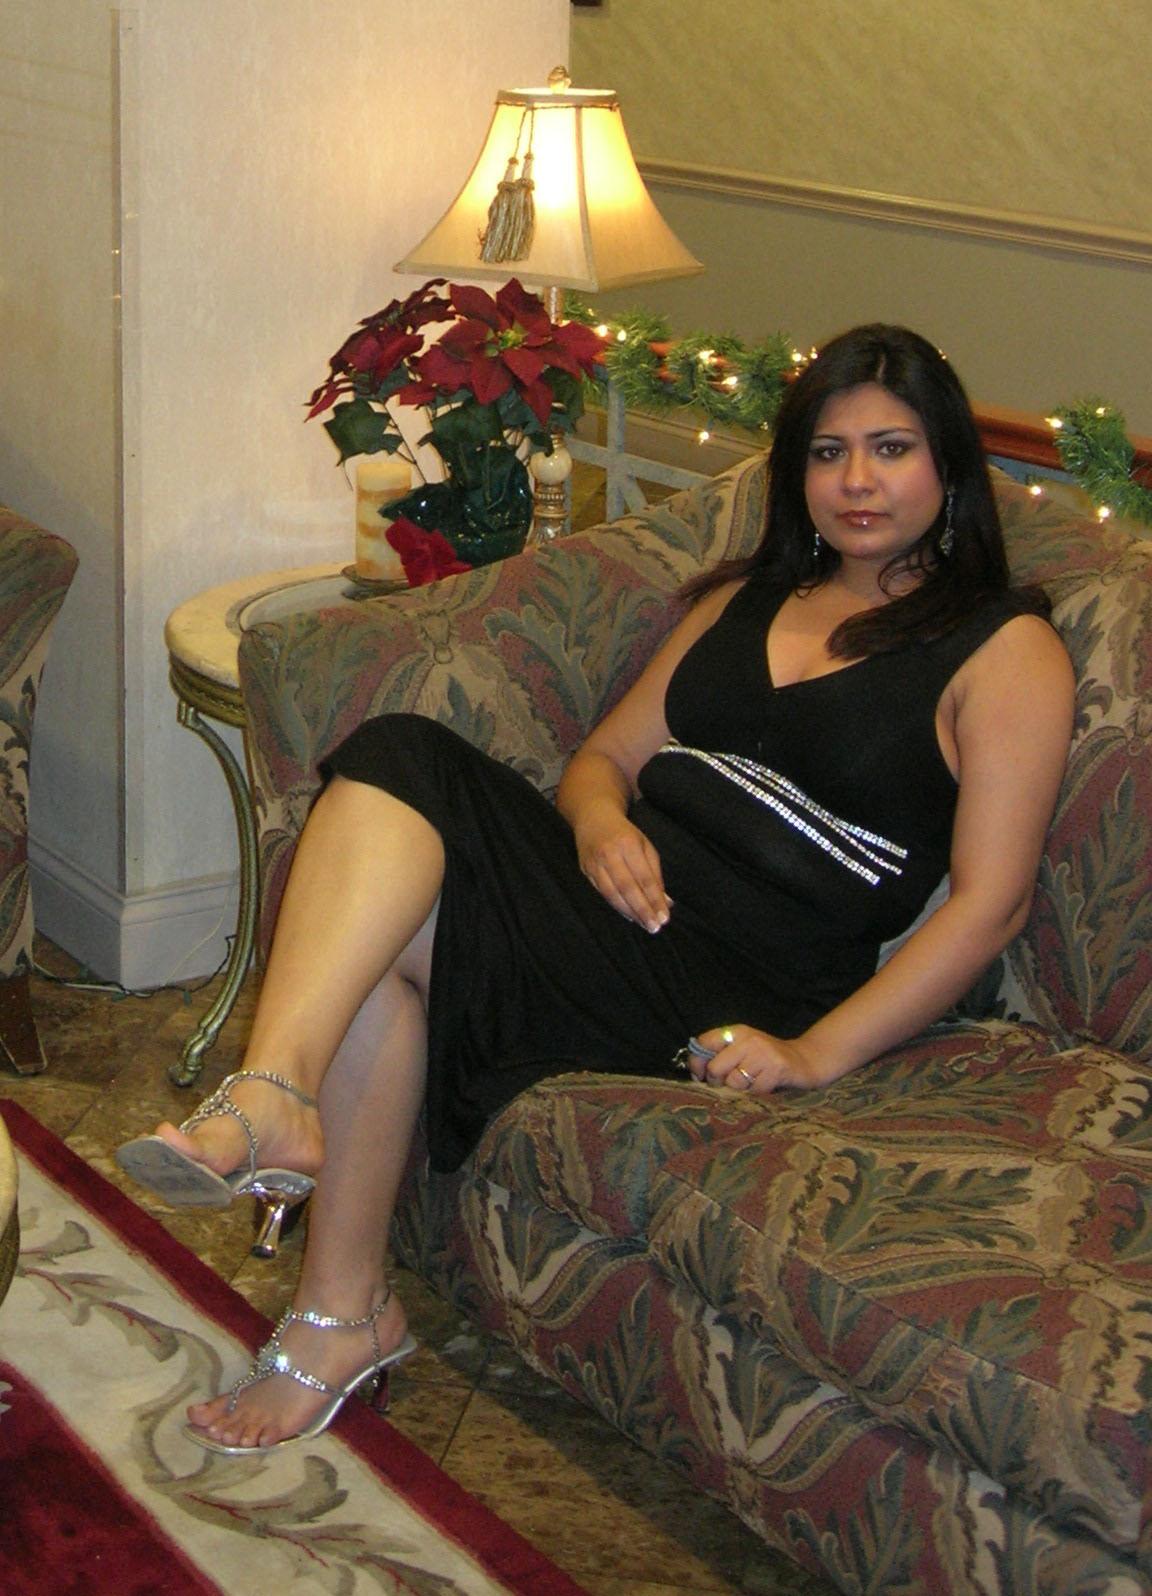 Rich arab dating site